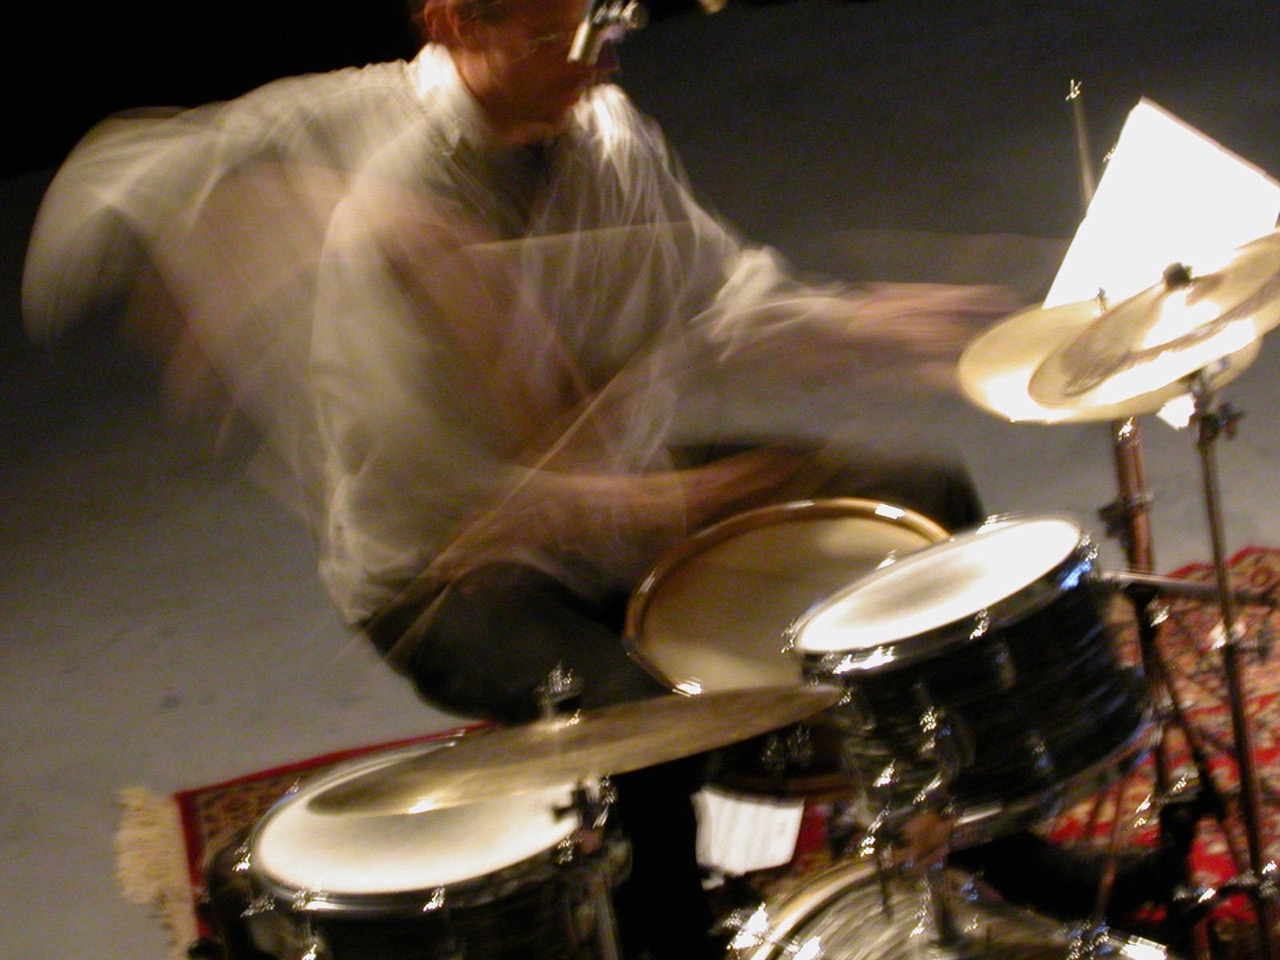 blurry Curt mi3 source.jpg